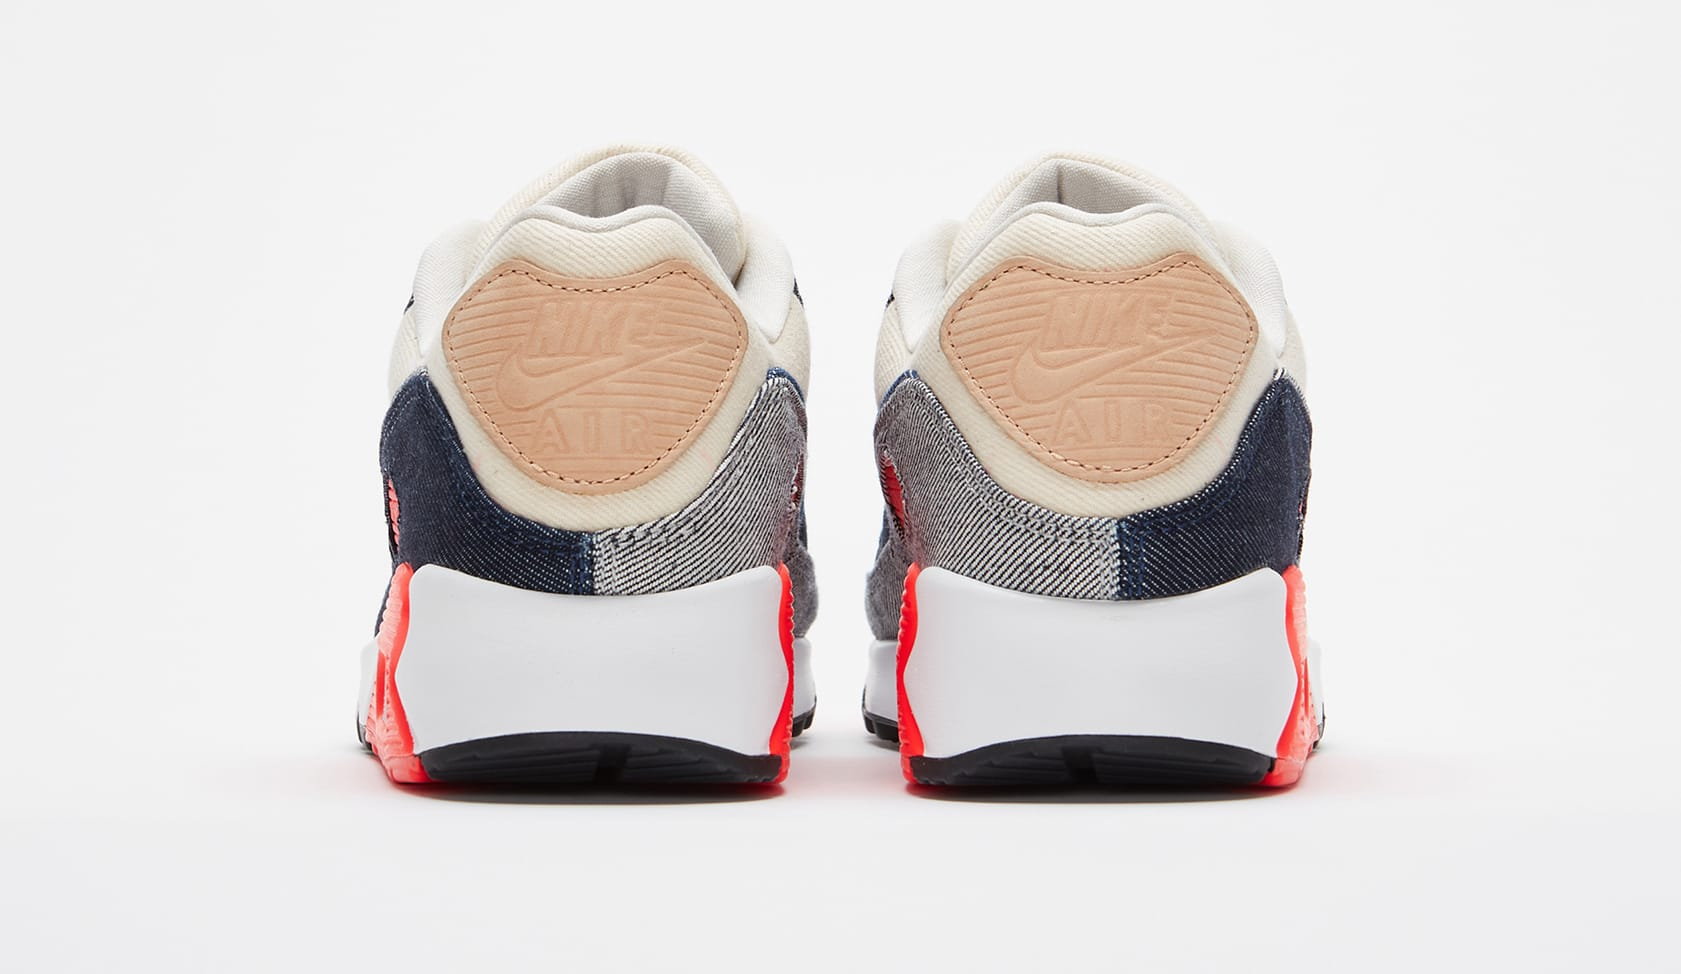 Denham x Nike Air Max 90 Heel